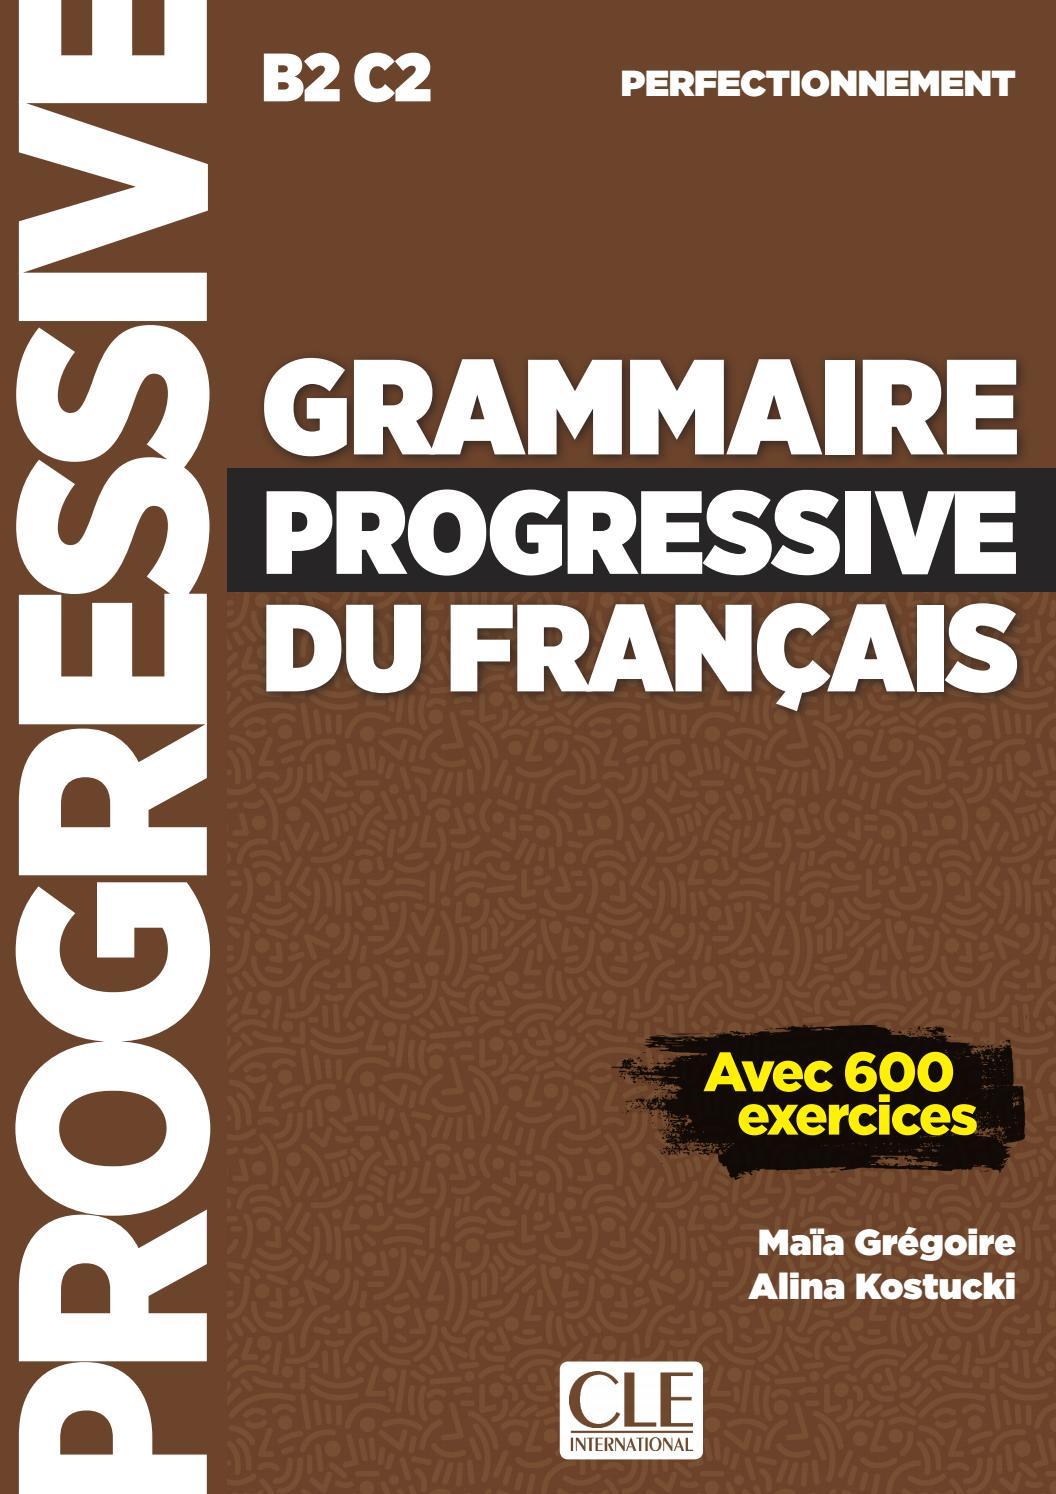 Grammaire Progressive Du Francais Perfectionnement By Cle International Issuu